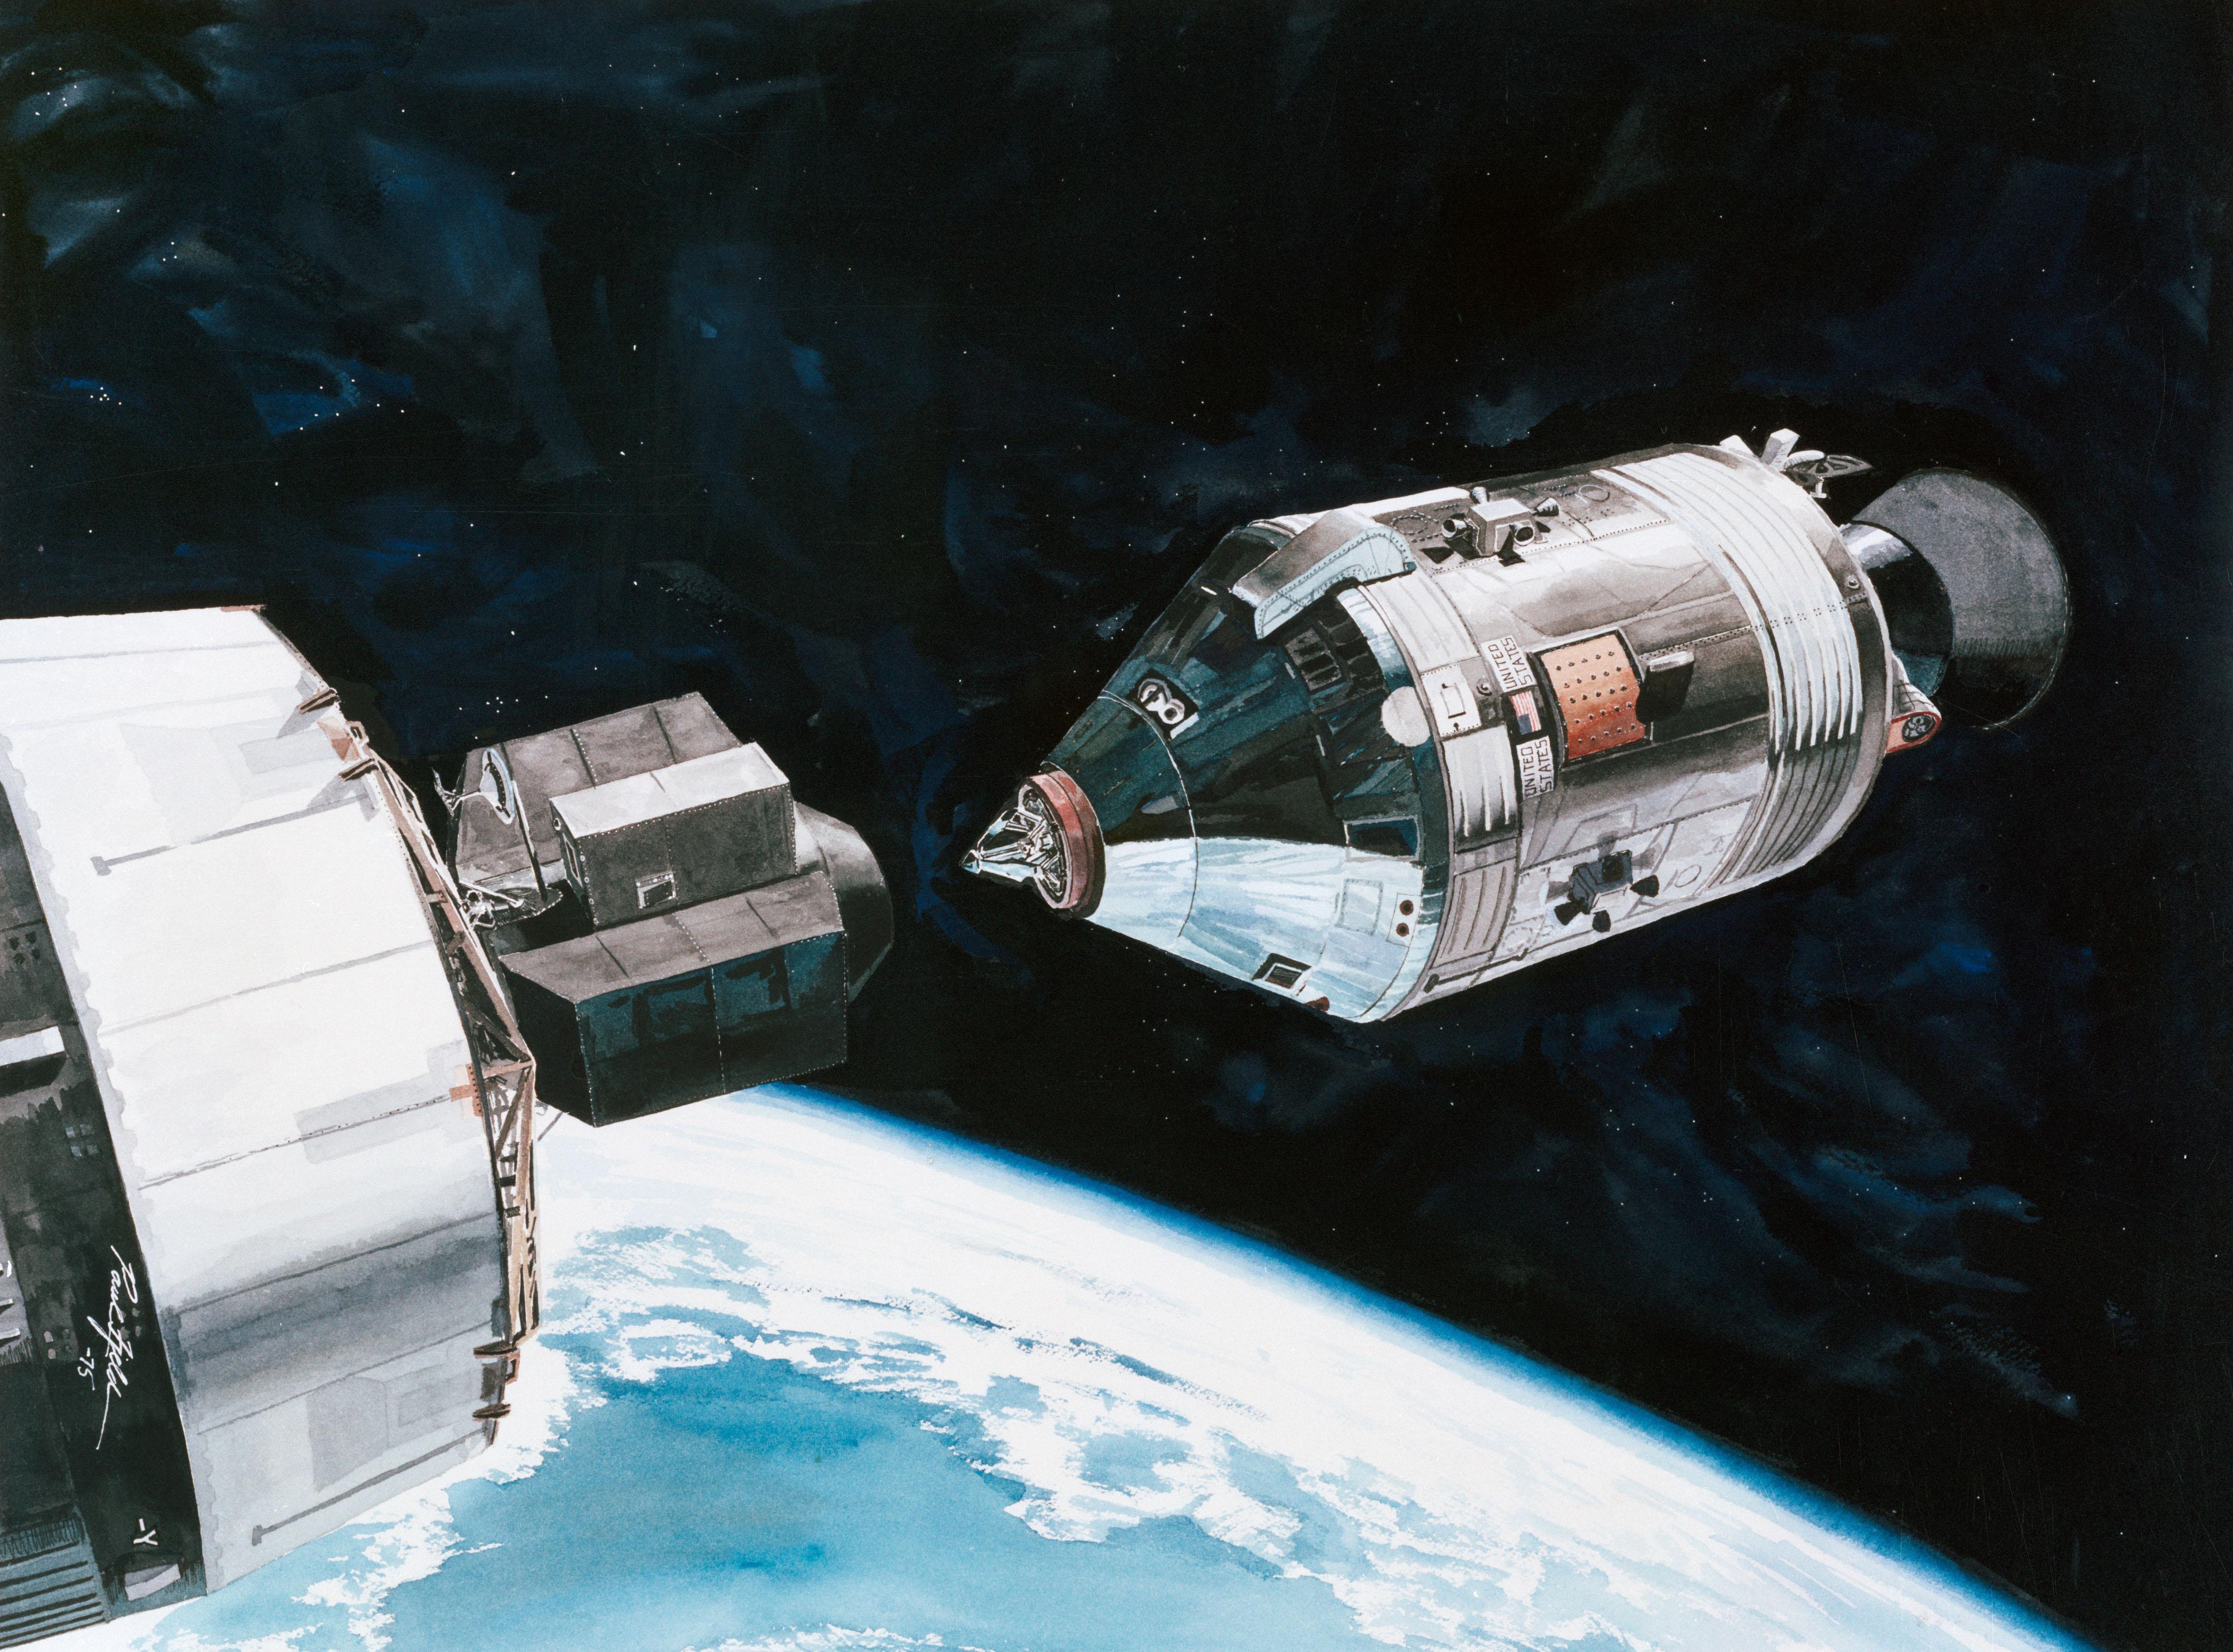 stages of apollo spacecraft docking - photo #37